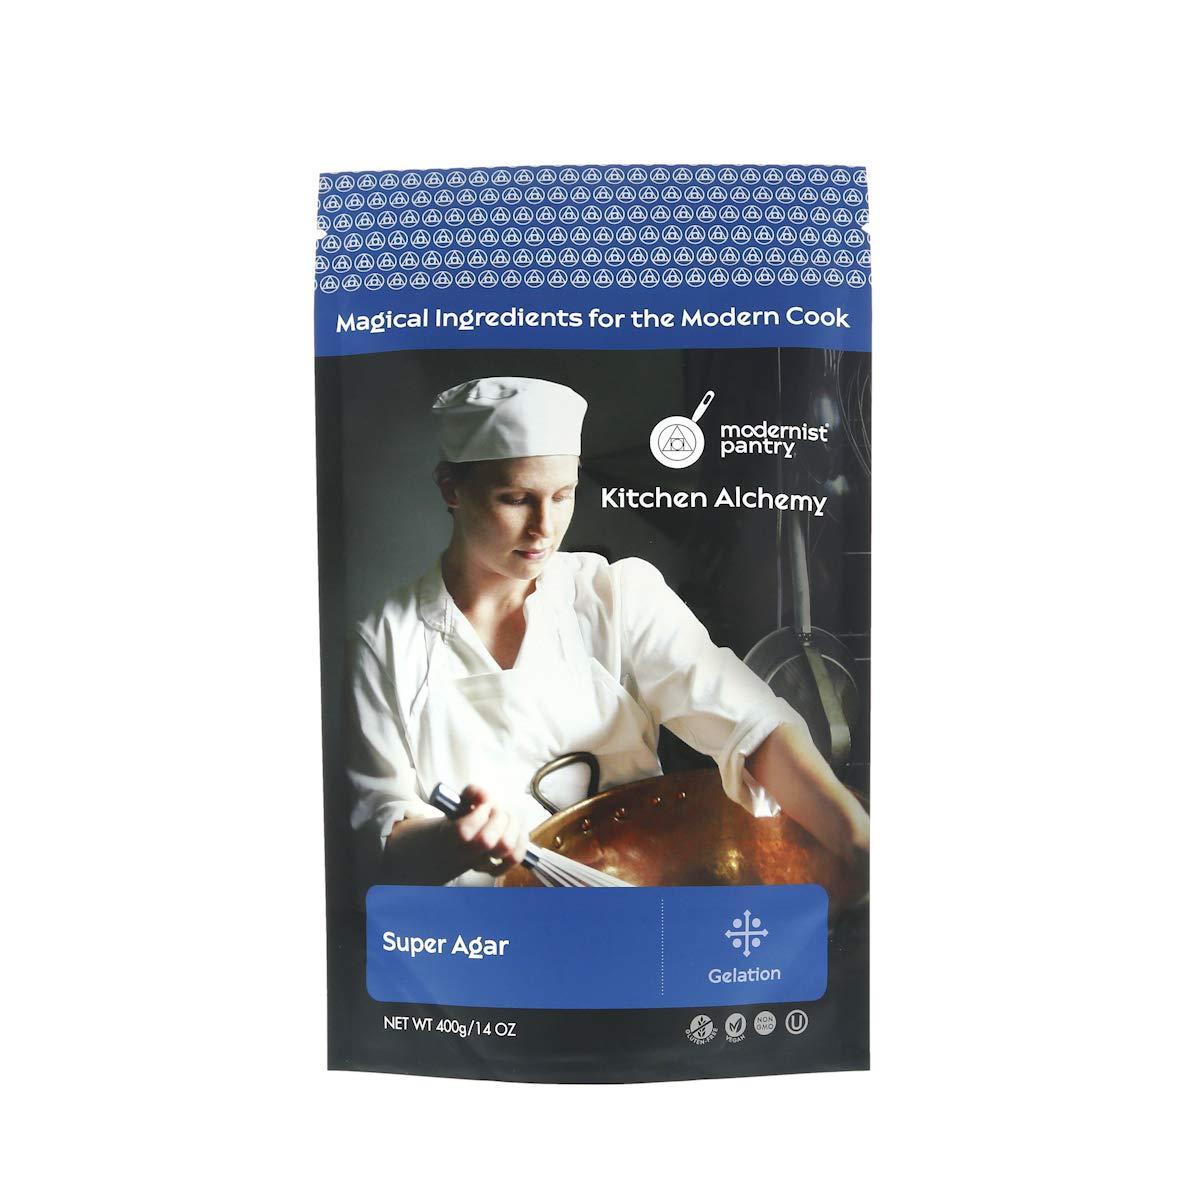 Super Agar Powder (Molecular Gastronomy) ⊘ Non-GMO ☮ Vegan ✡ OU Kosher Certified - 400g/14oz